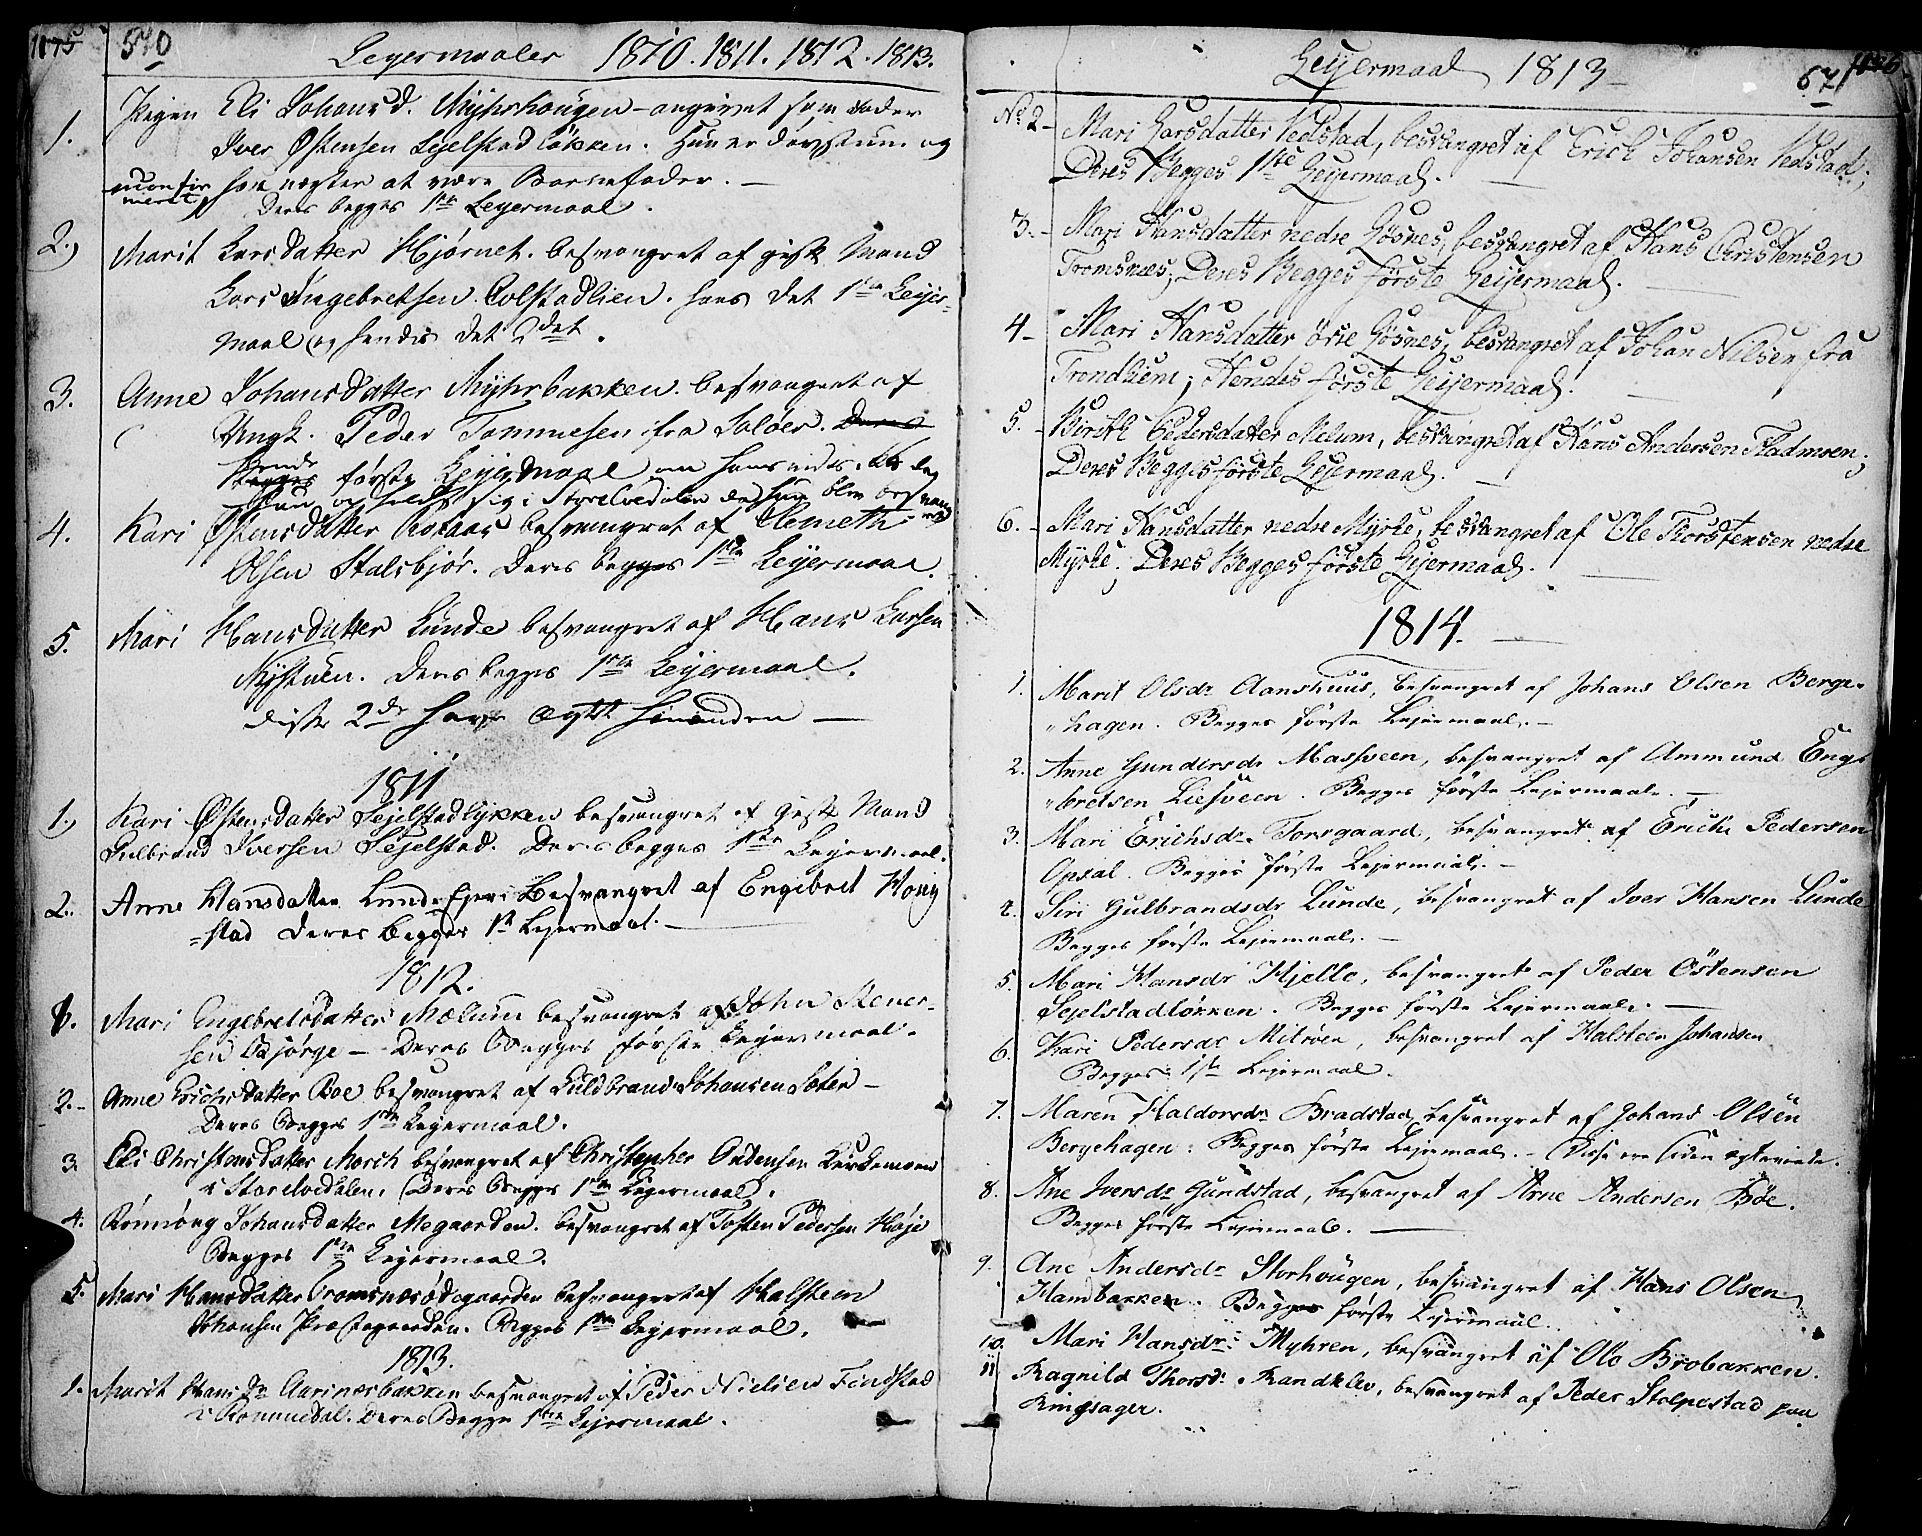 SAH, Ringebu prestekontor, Ministerialbok nr. 3, 1781-1820, s. 570-571